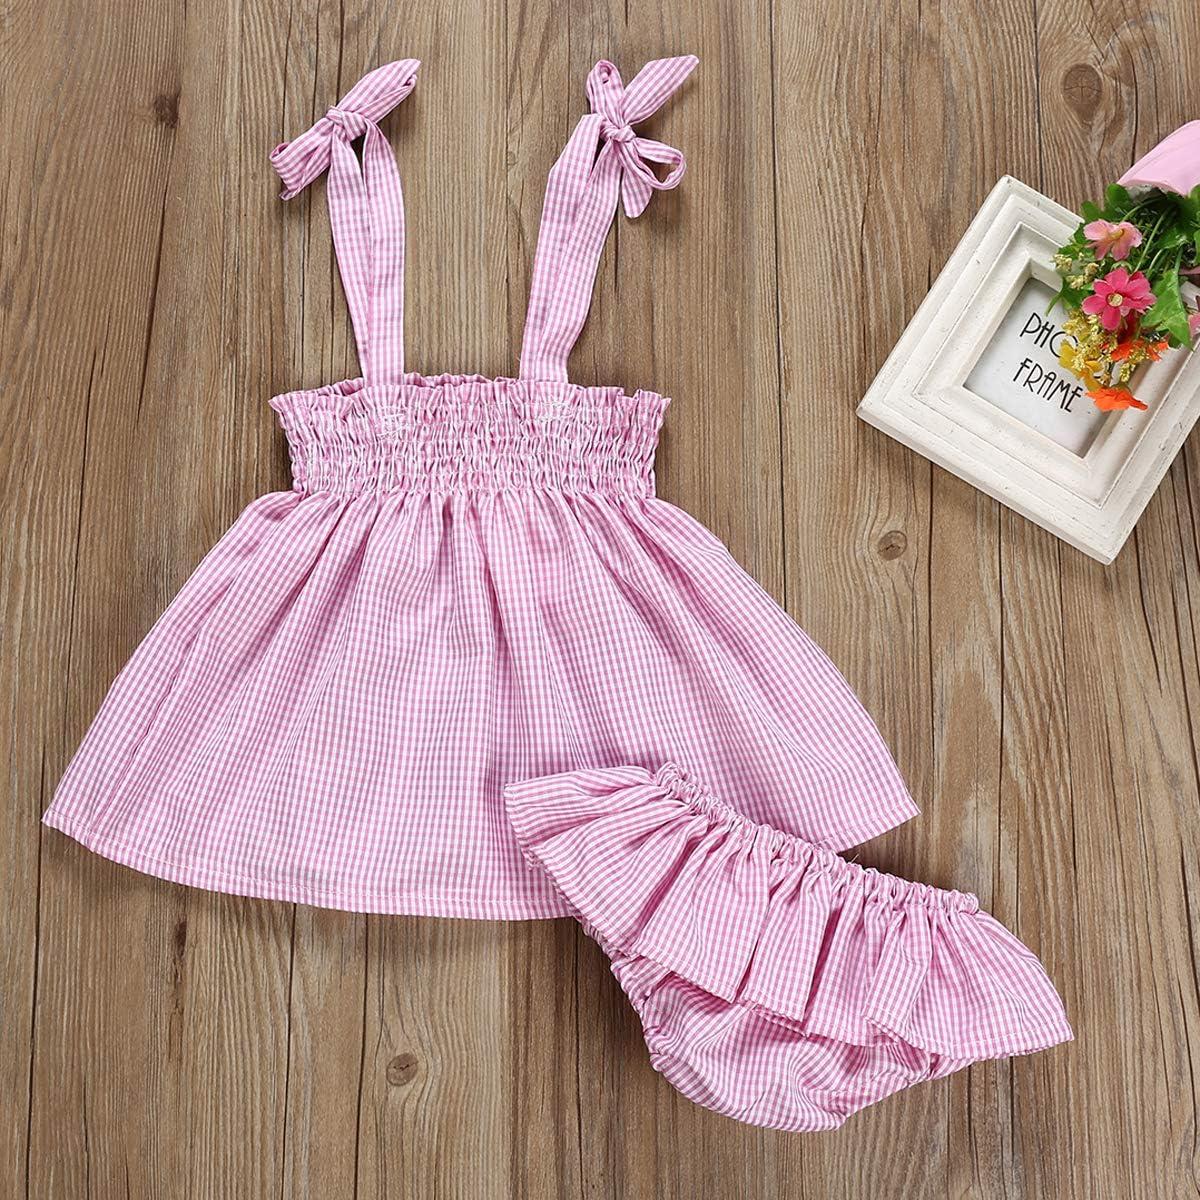 Ruffle Shorts Outfits Asisol Baby Girls Lattice Skirt Set Infant Girls Suspender Shirt